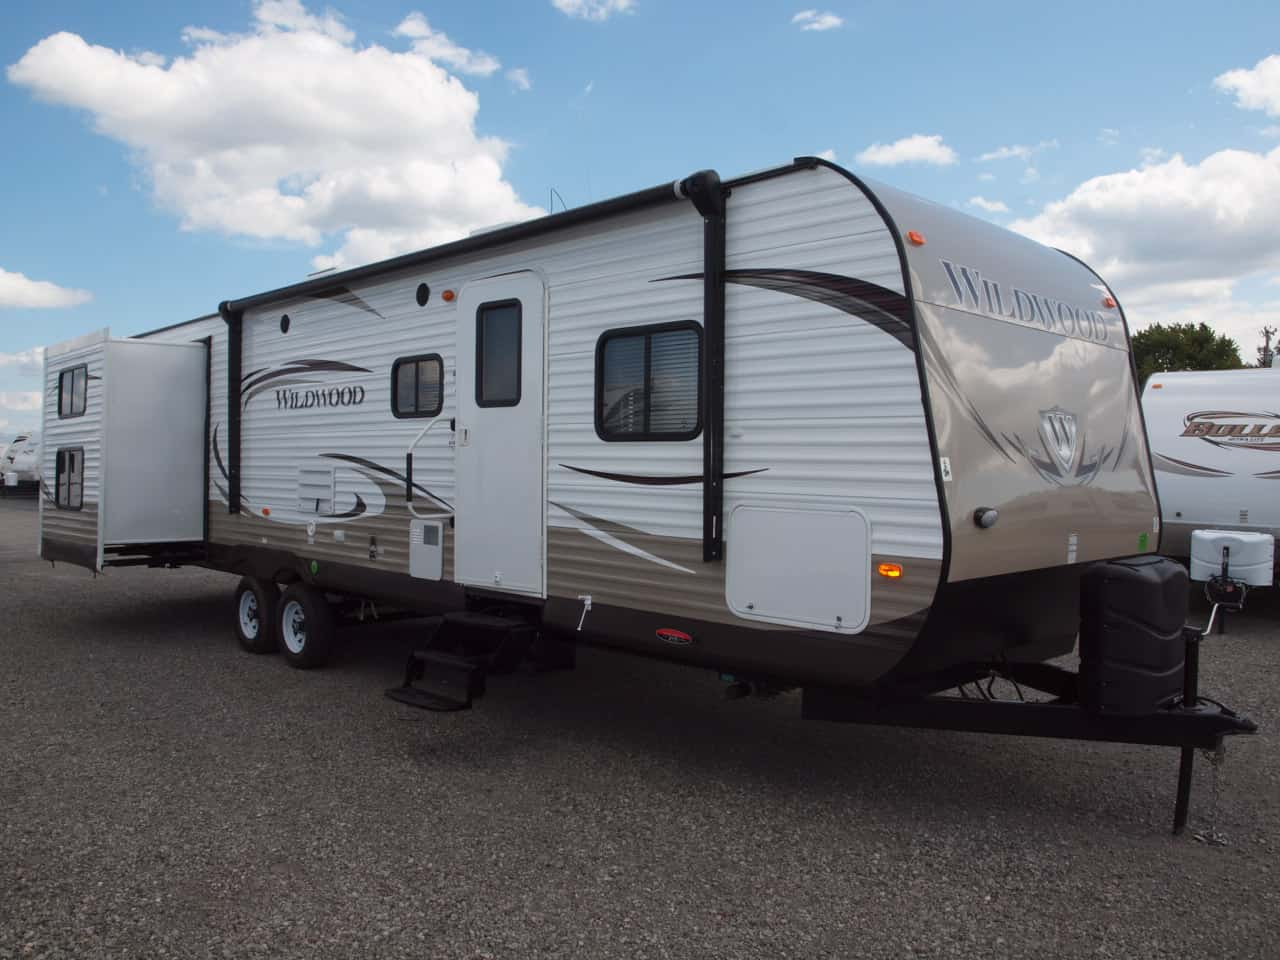 Wildwood 35' travel trailer for rent - RV rentals Phoenix AZ - Going Places RV Rentalls